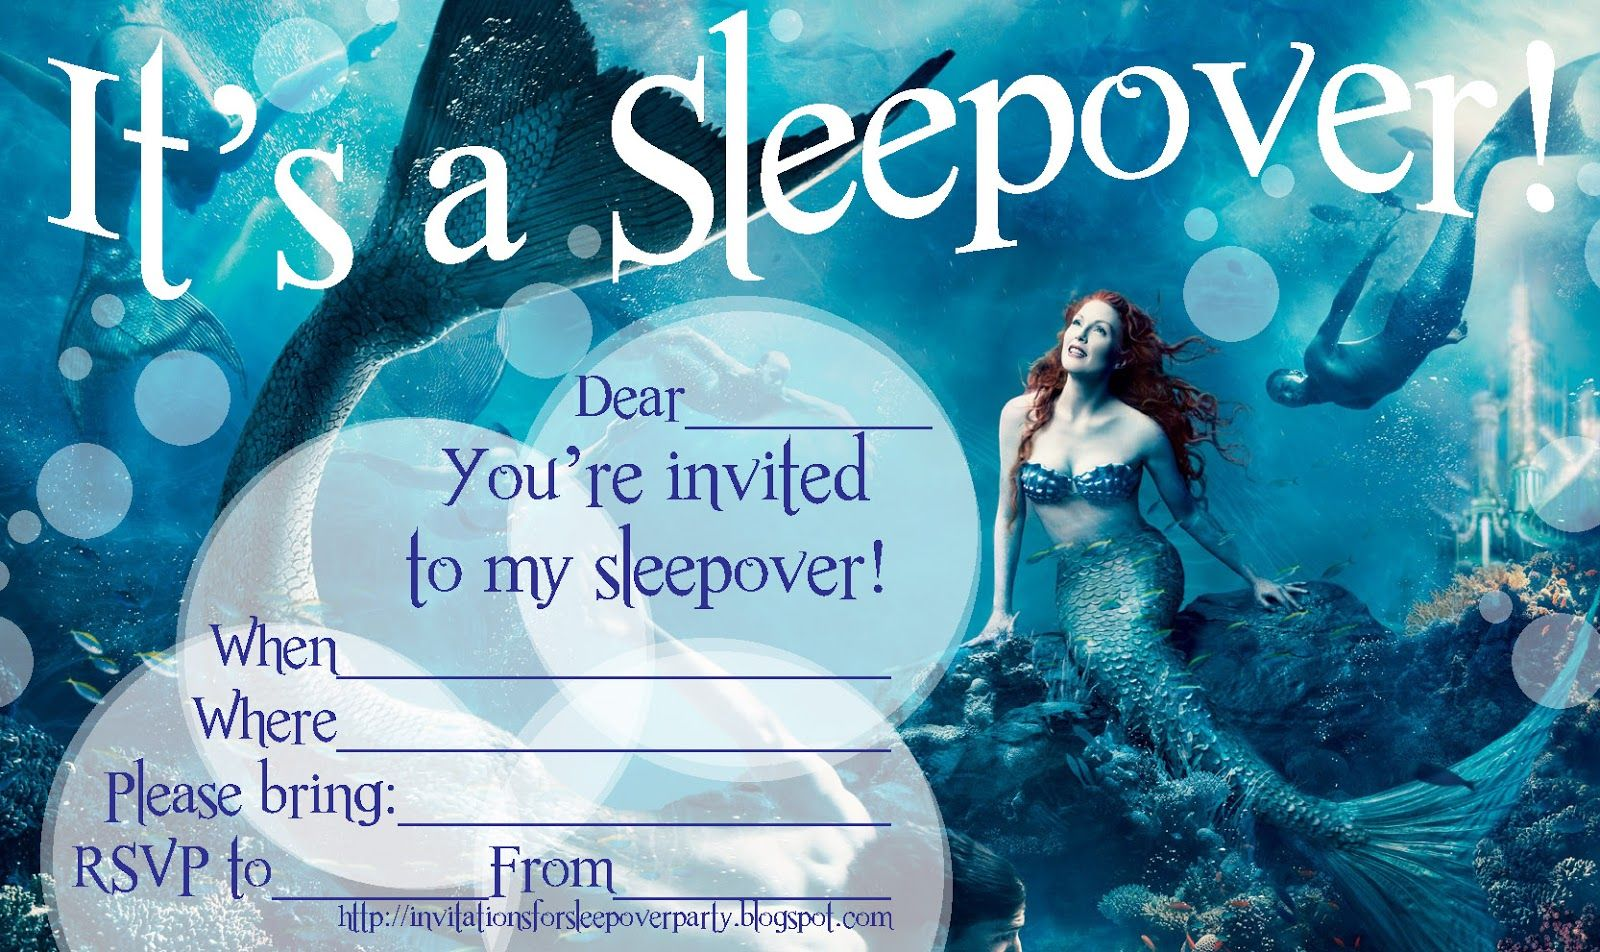 mermaid+sleepoverinvitation+fill+in+the+blanks.jpg (1600×952)   Sleepover  party, Birthday sleepover ideas, Sleepover invitations